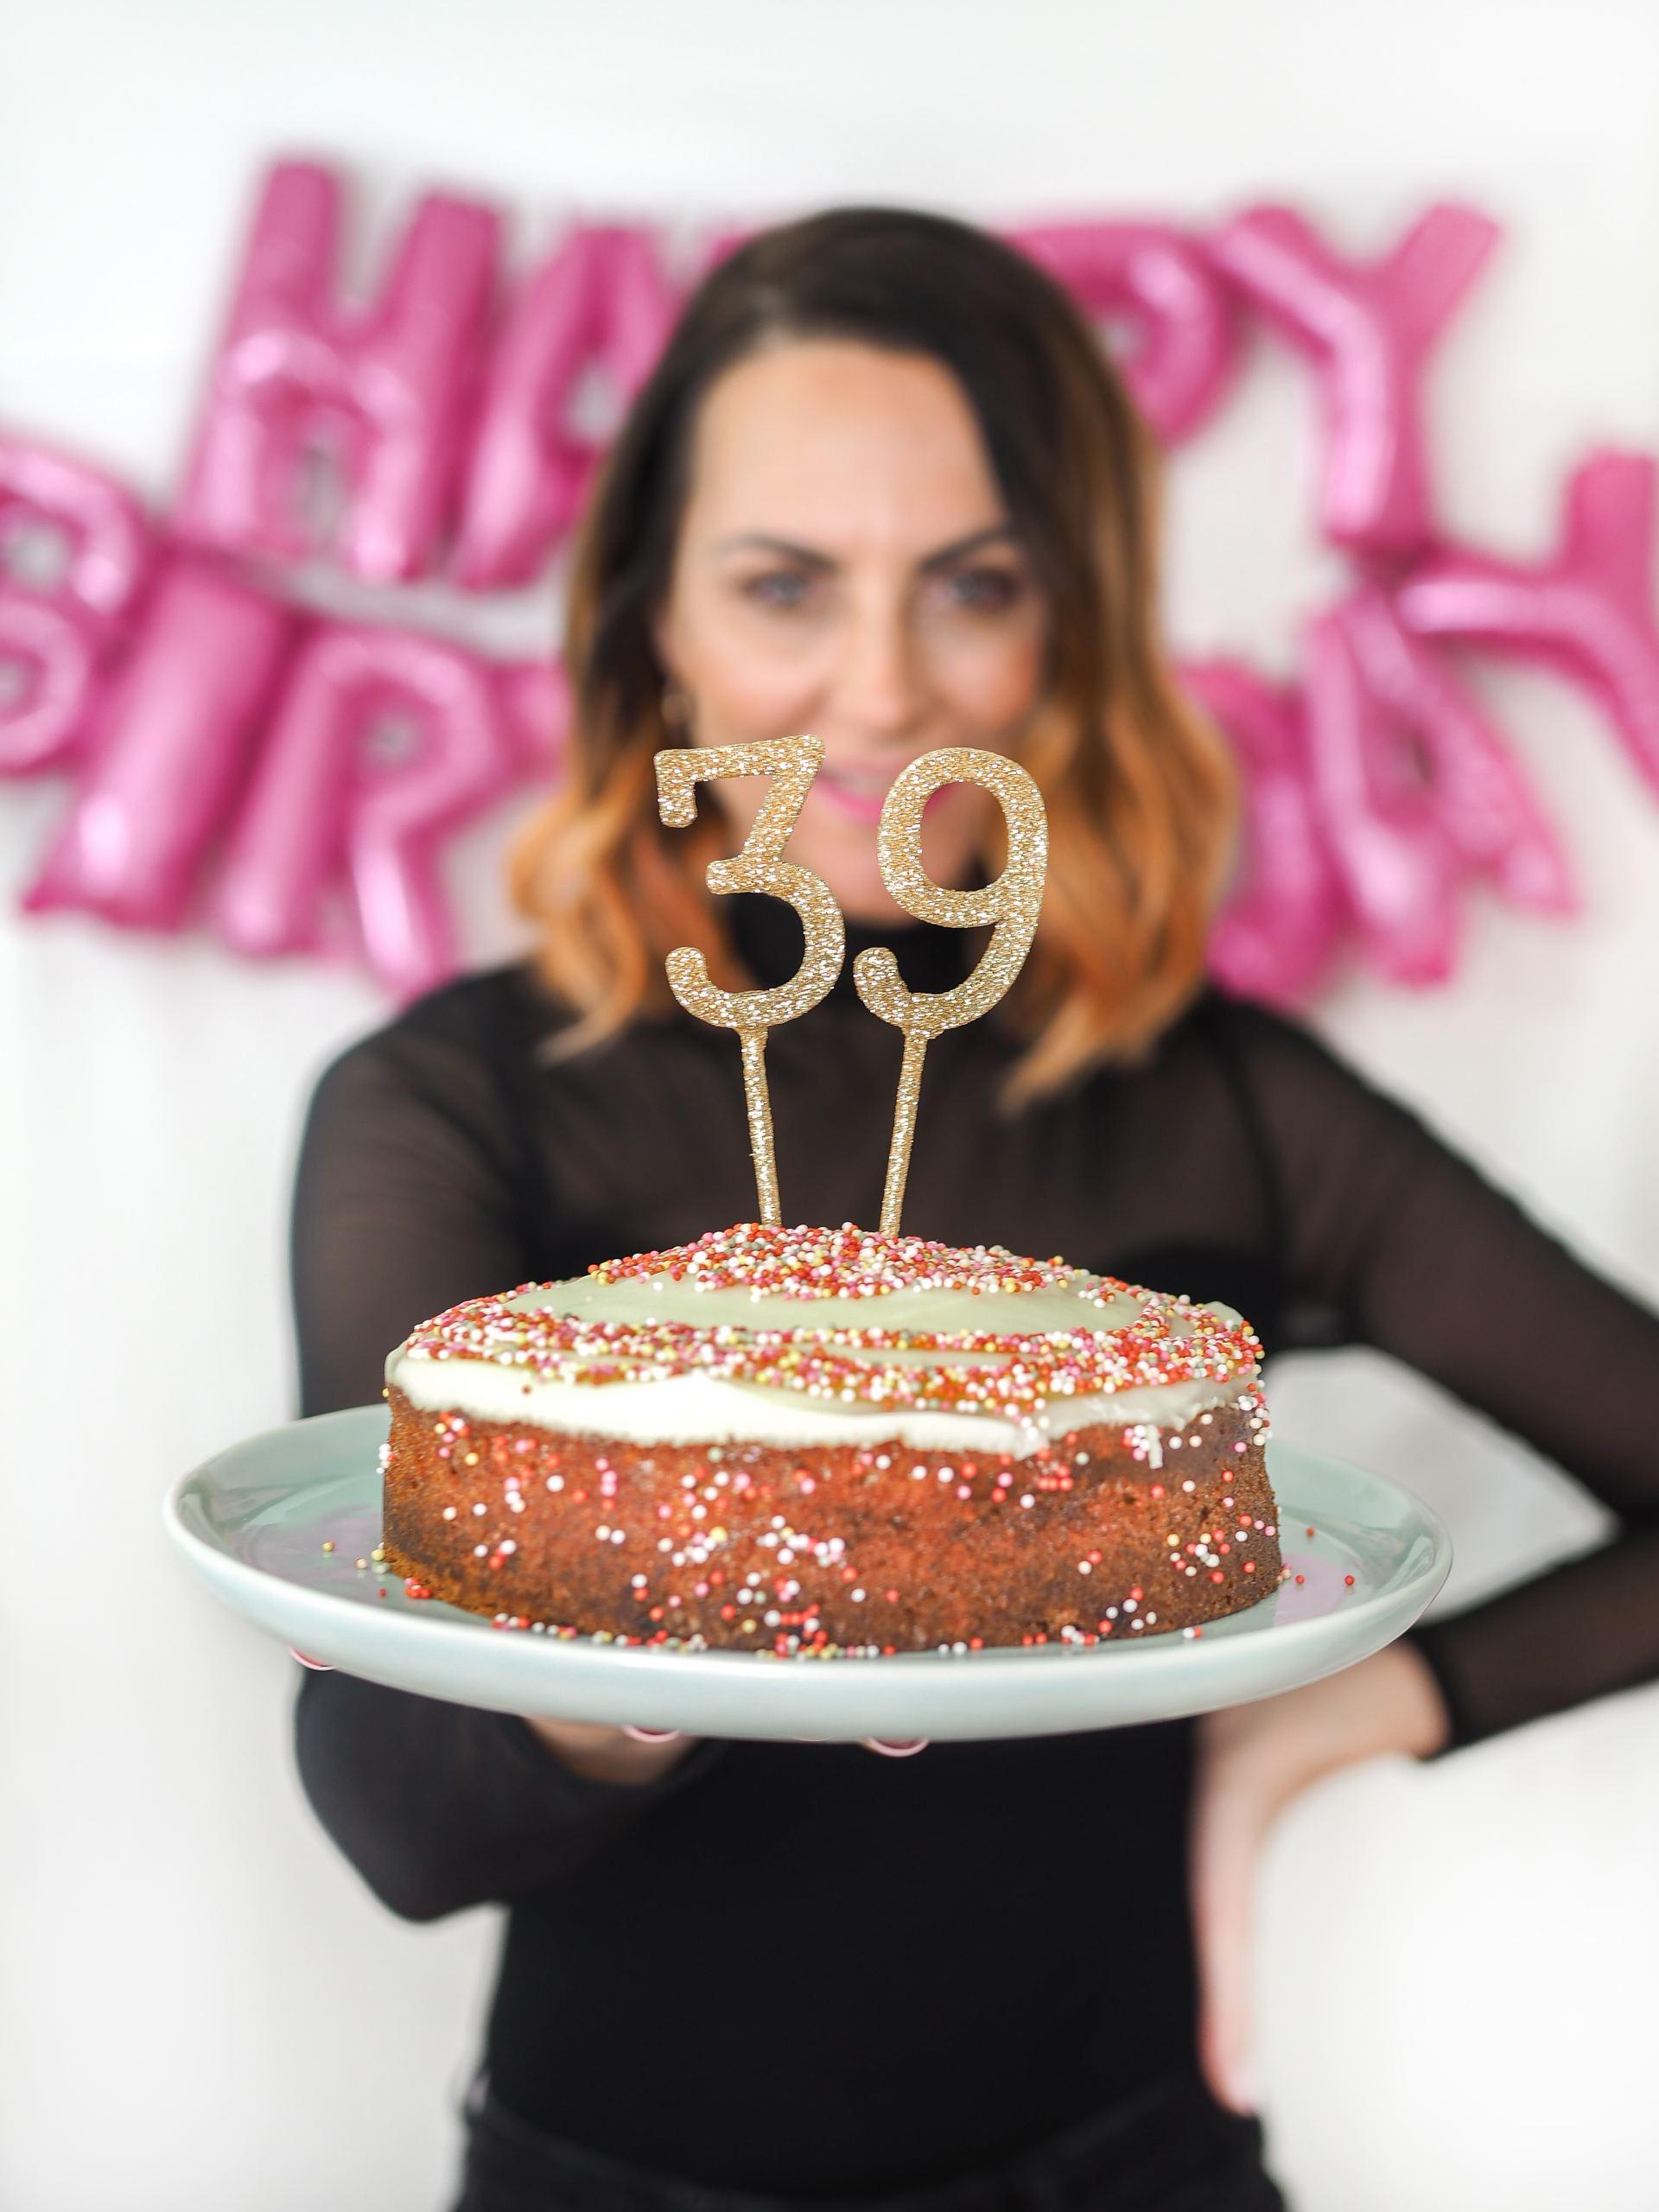 birthday cake and confetti photo